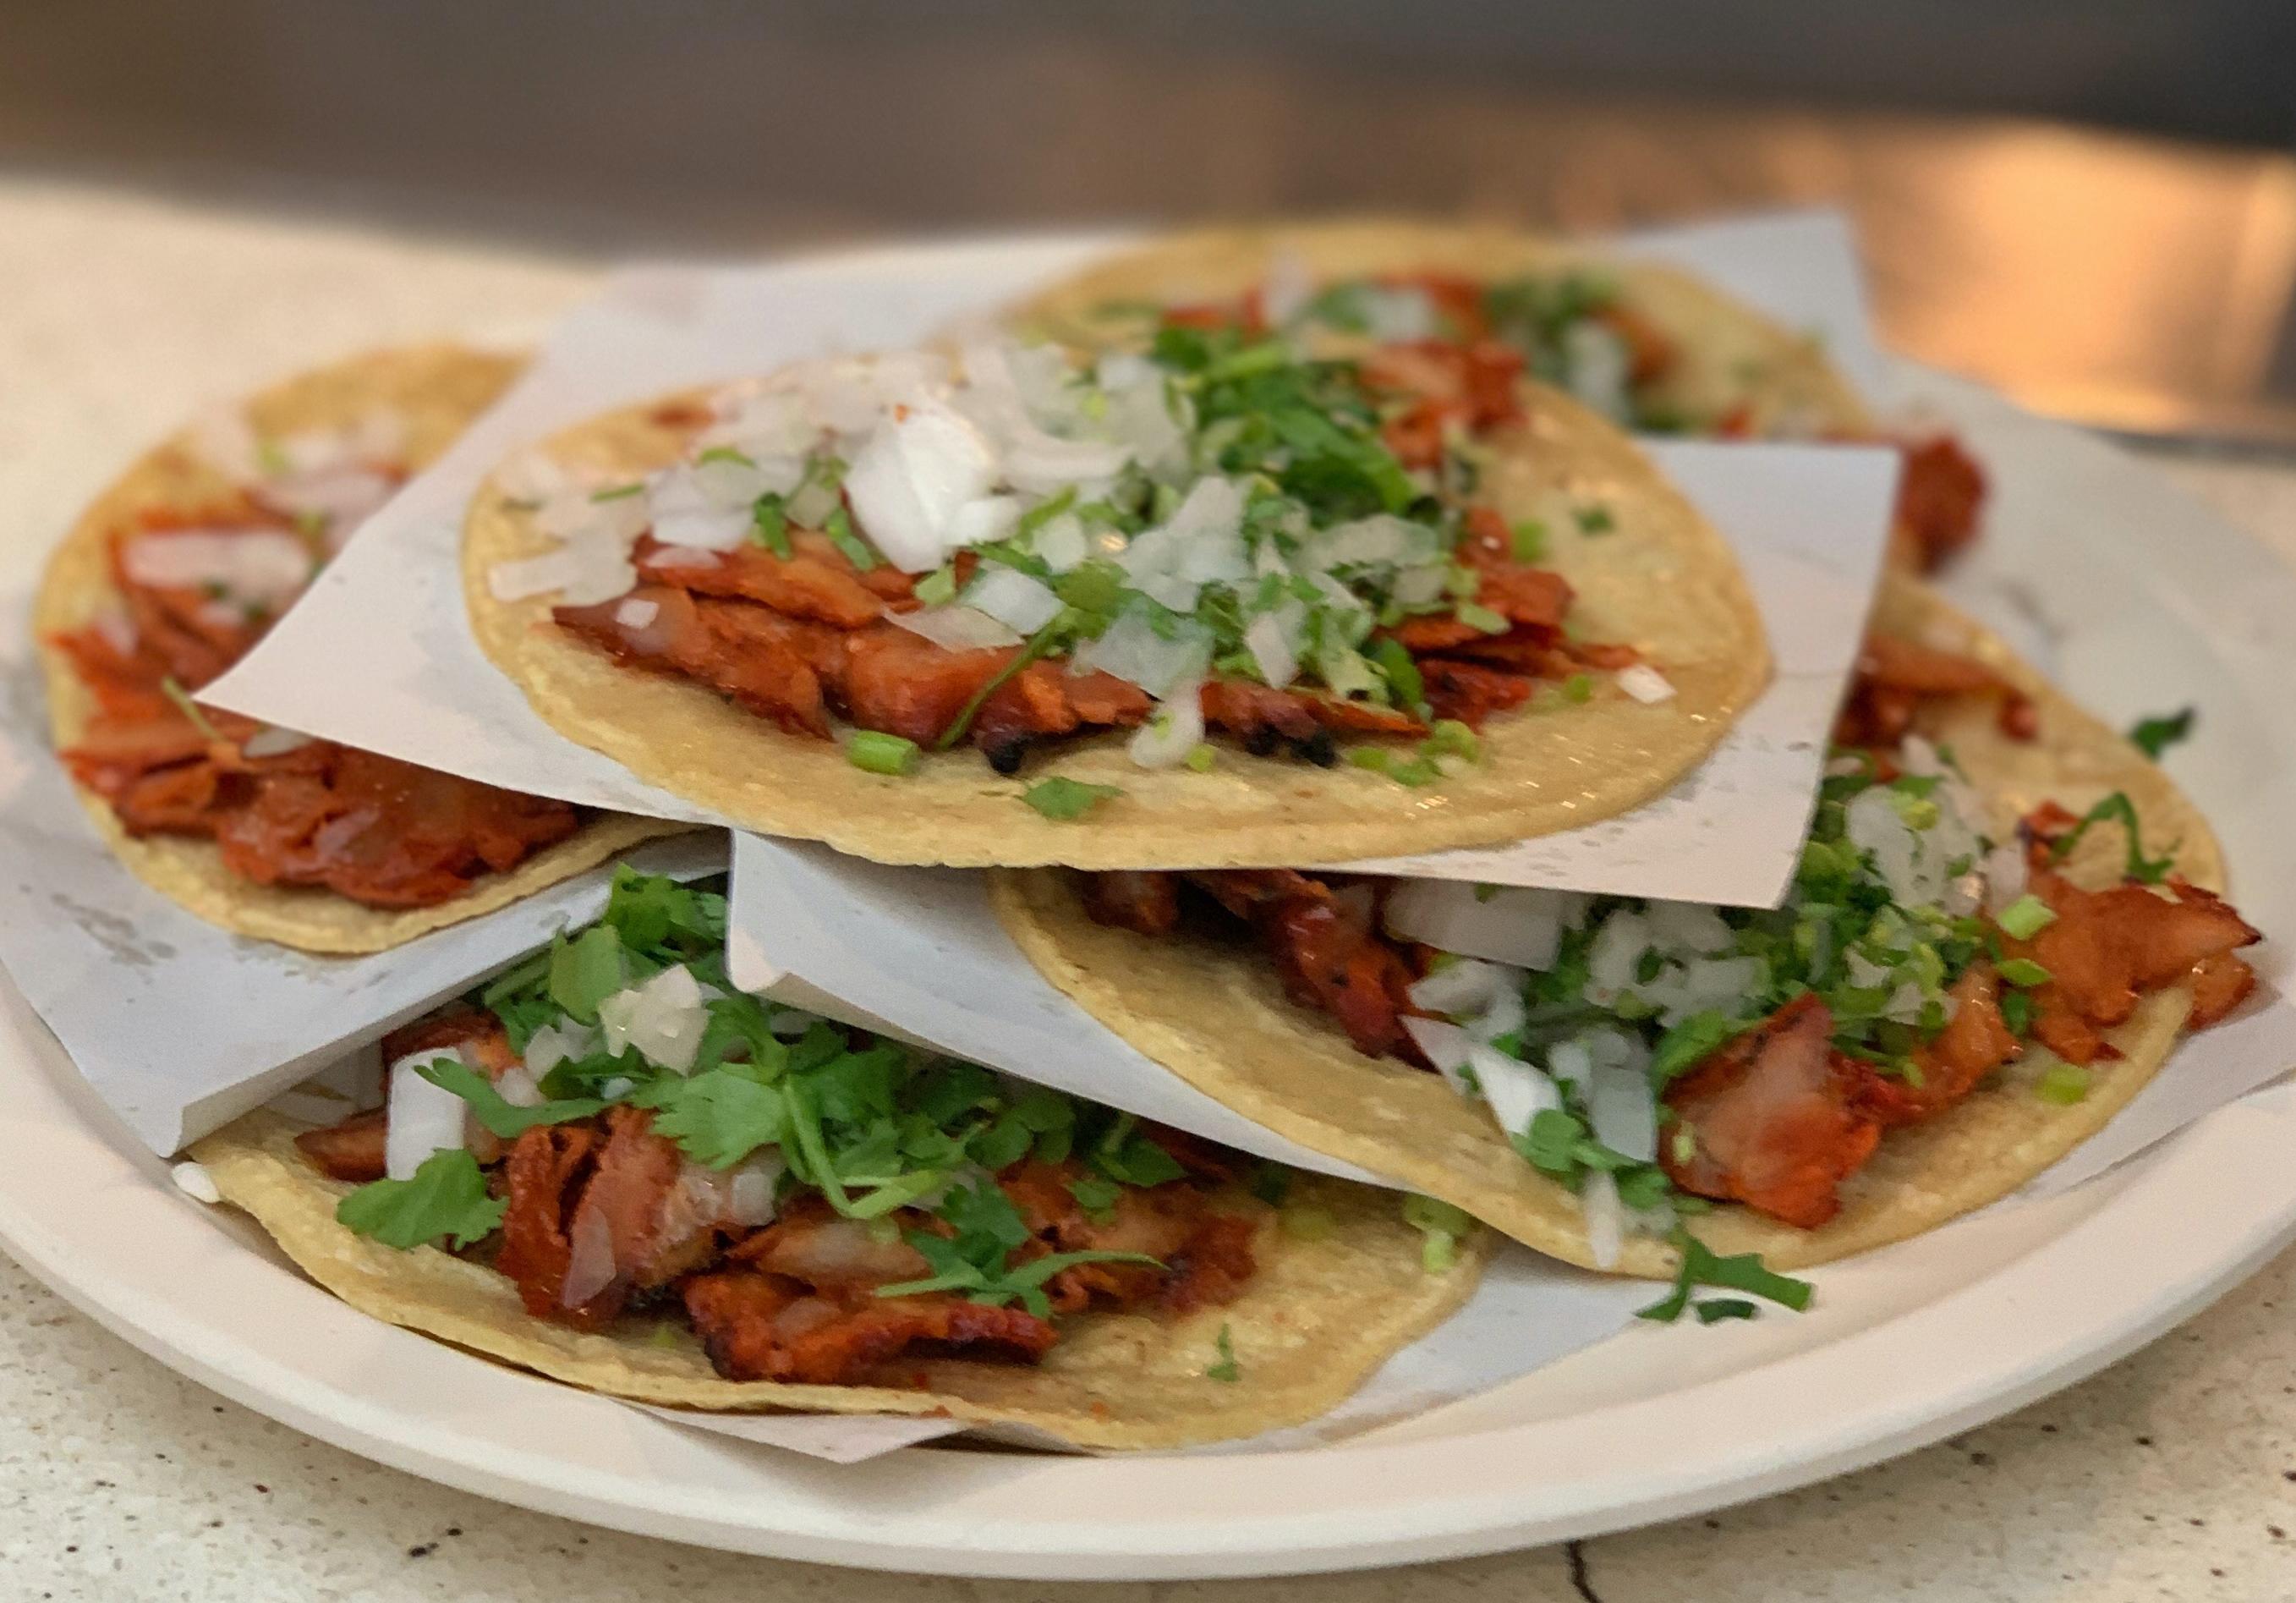 Tacos al pastor Imagen: Alfonso Romay